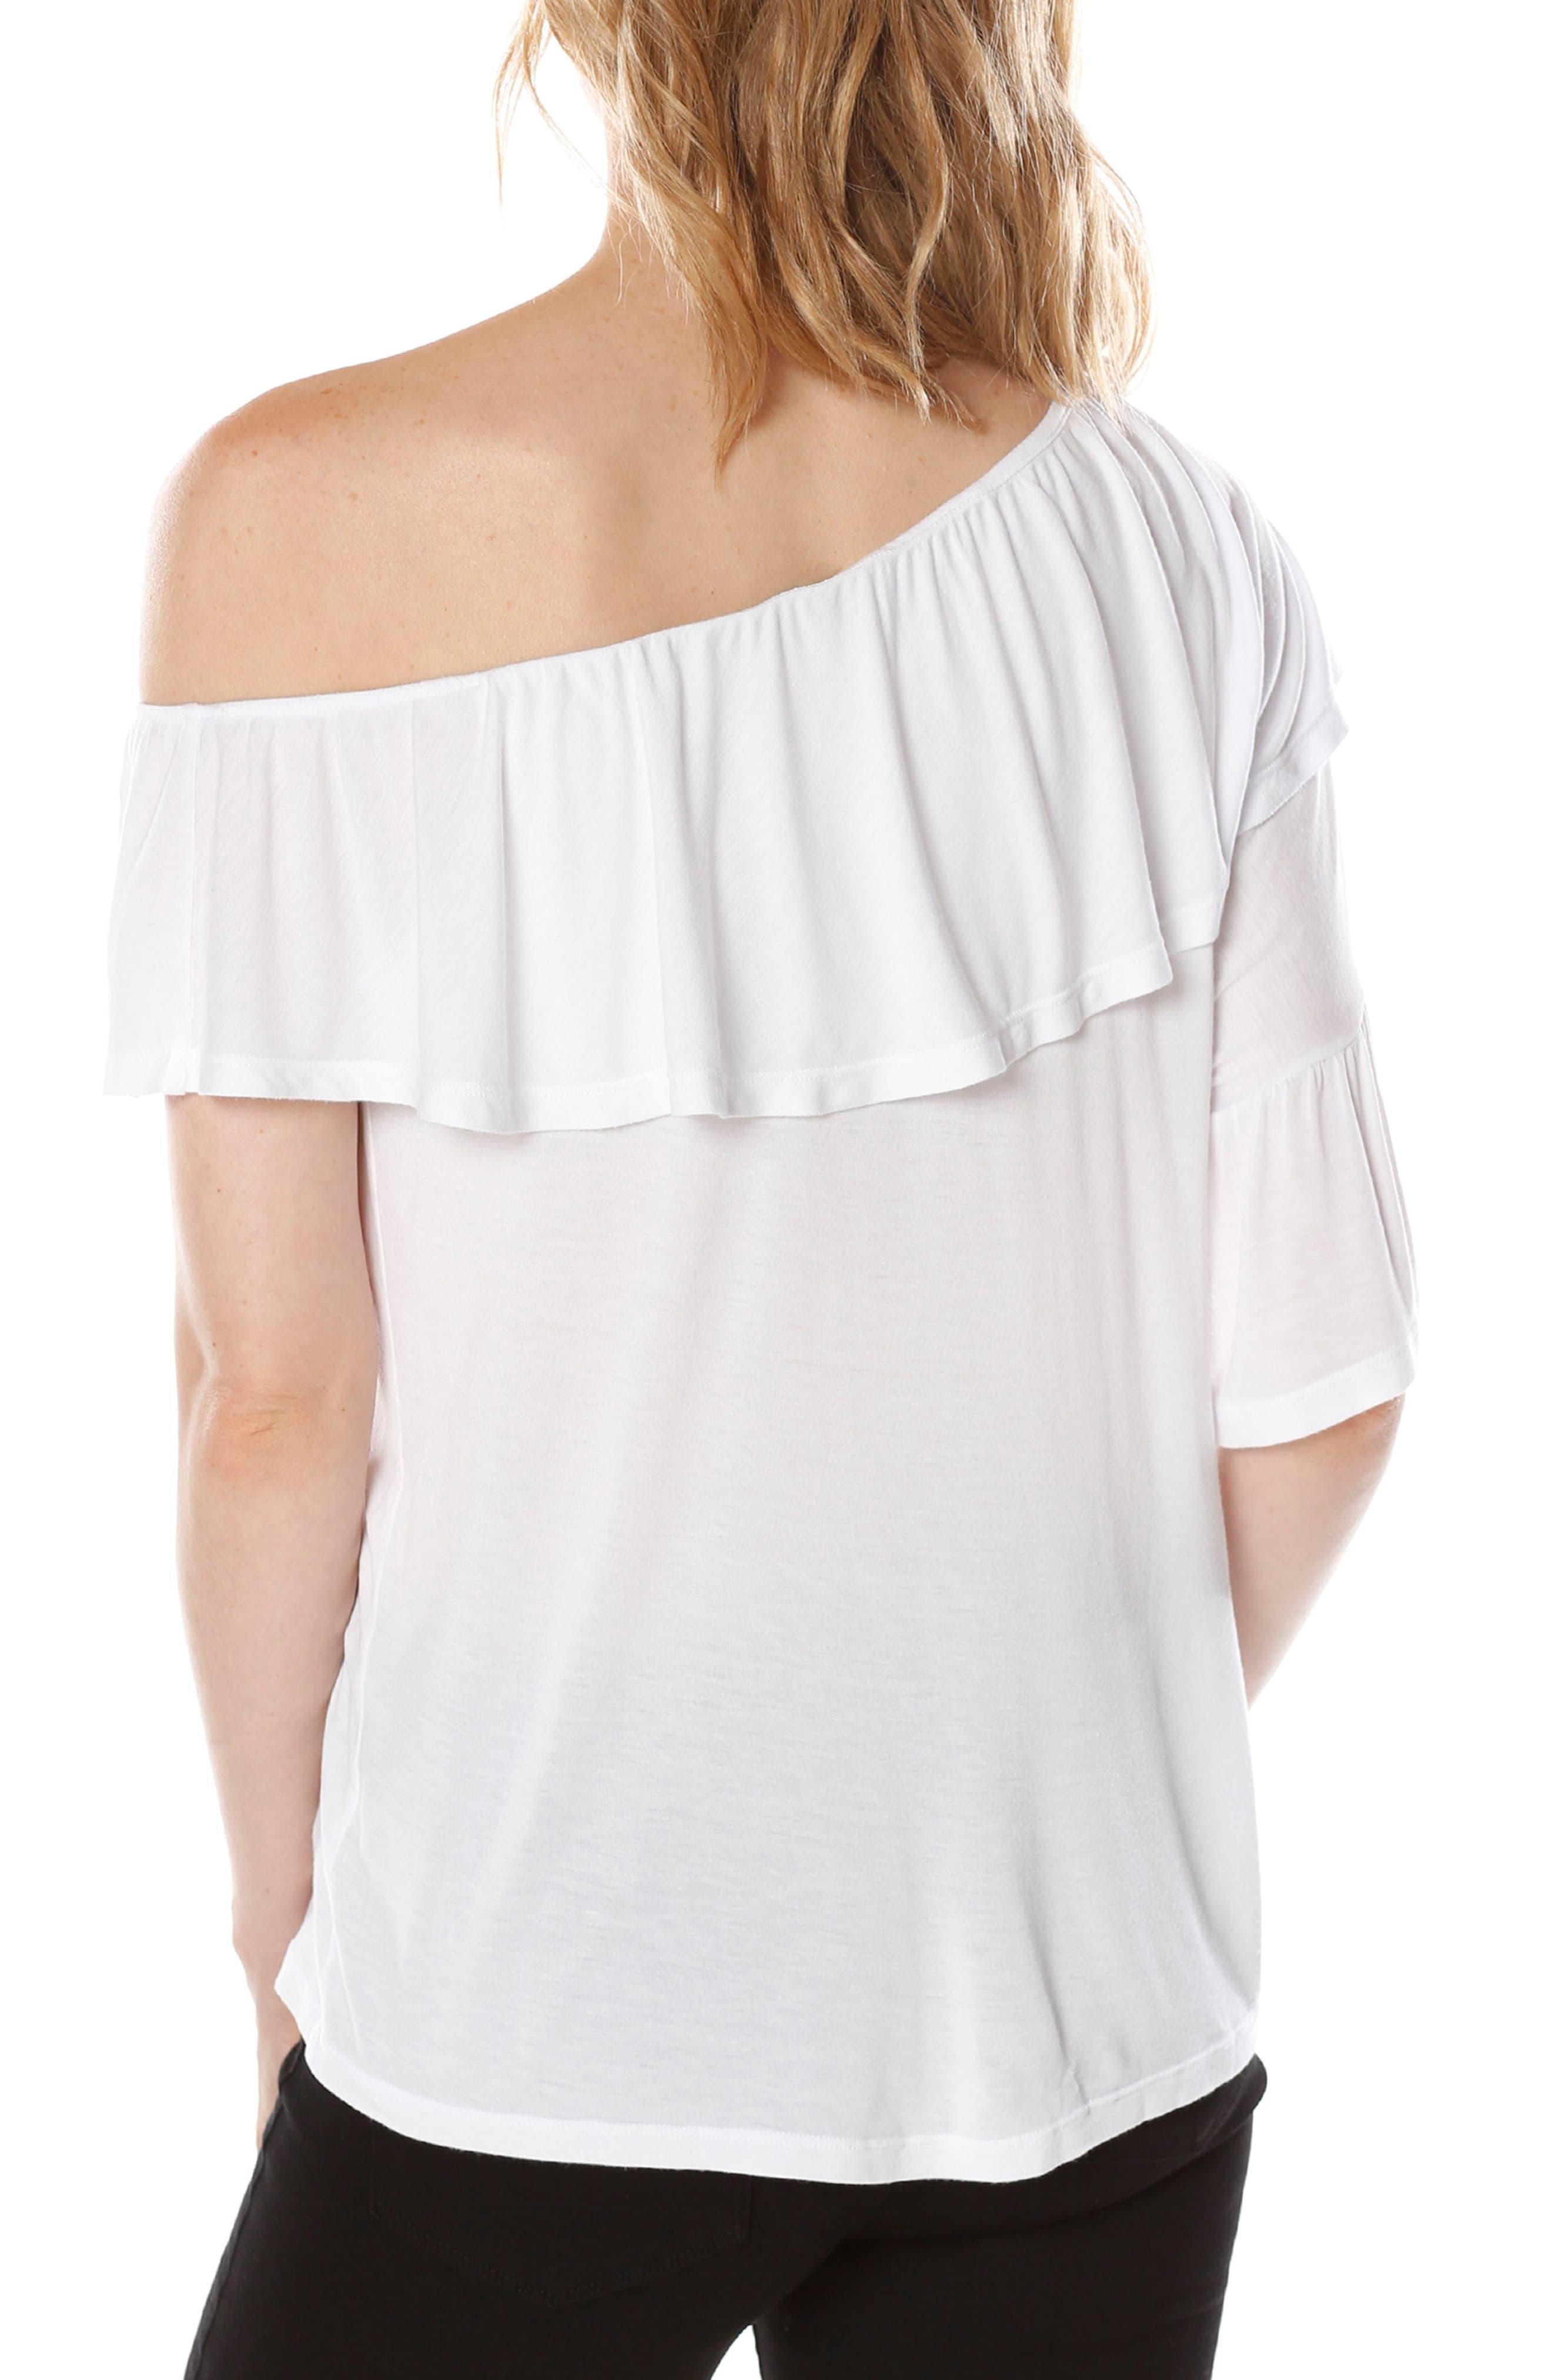 Pax One-Shoulder Top,                             Alternate thumbnail 3, color,                             Optic White